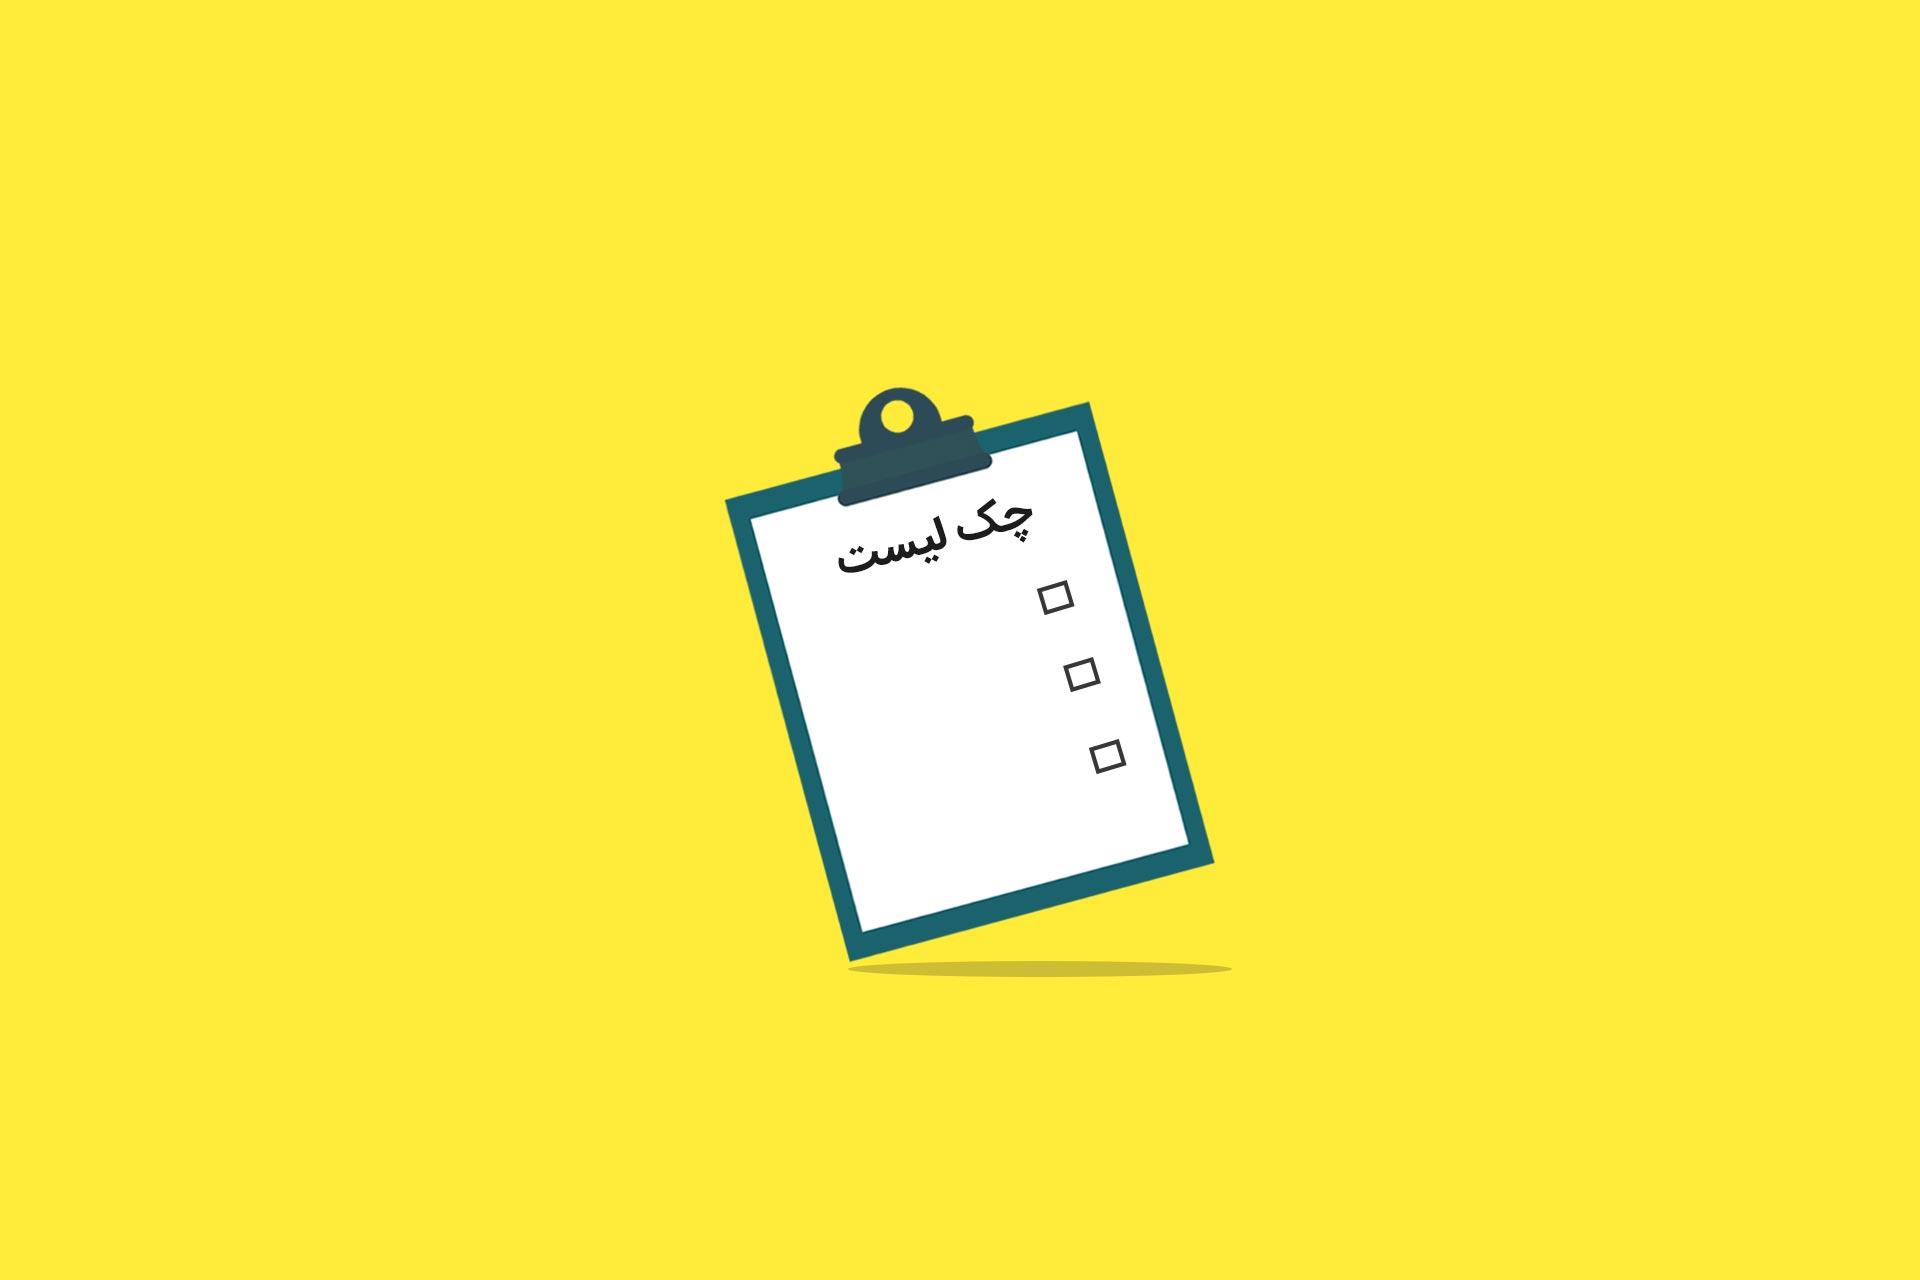 تهیه چک لیست، قبل از طراحی پاورپوینت